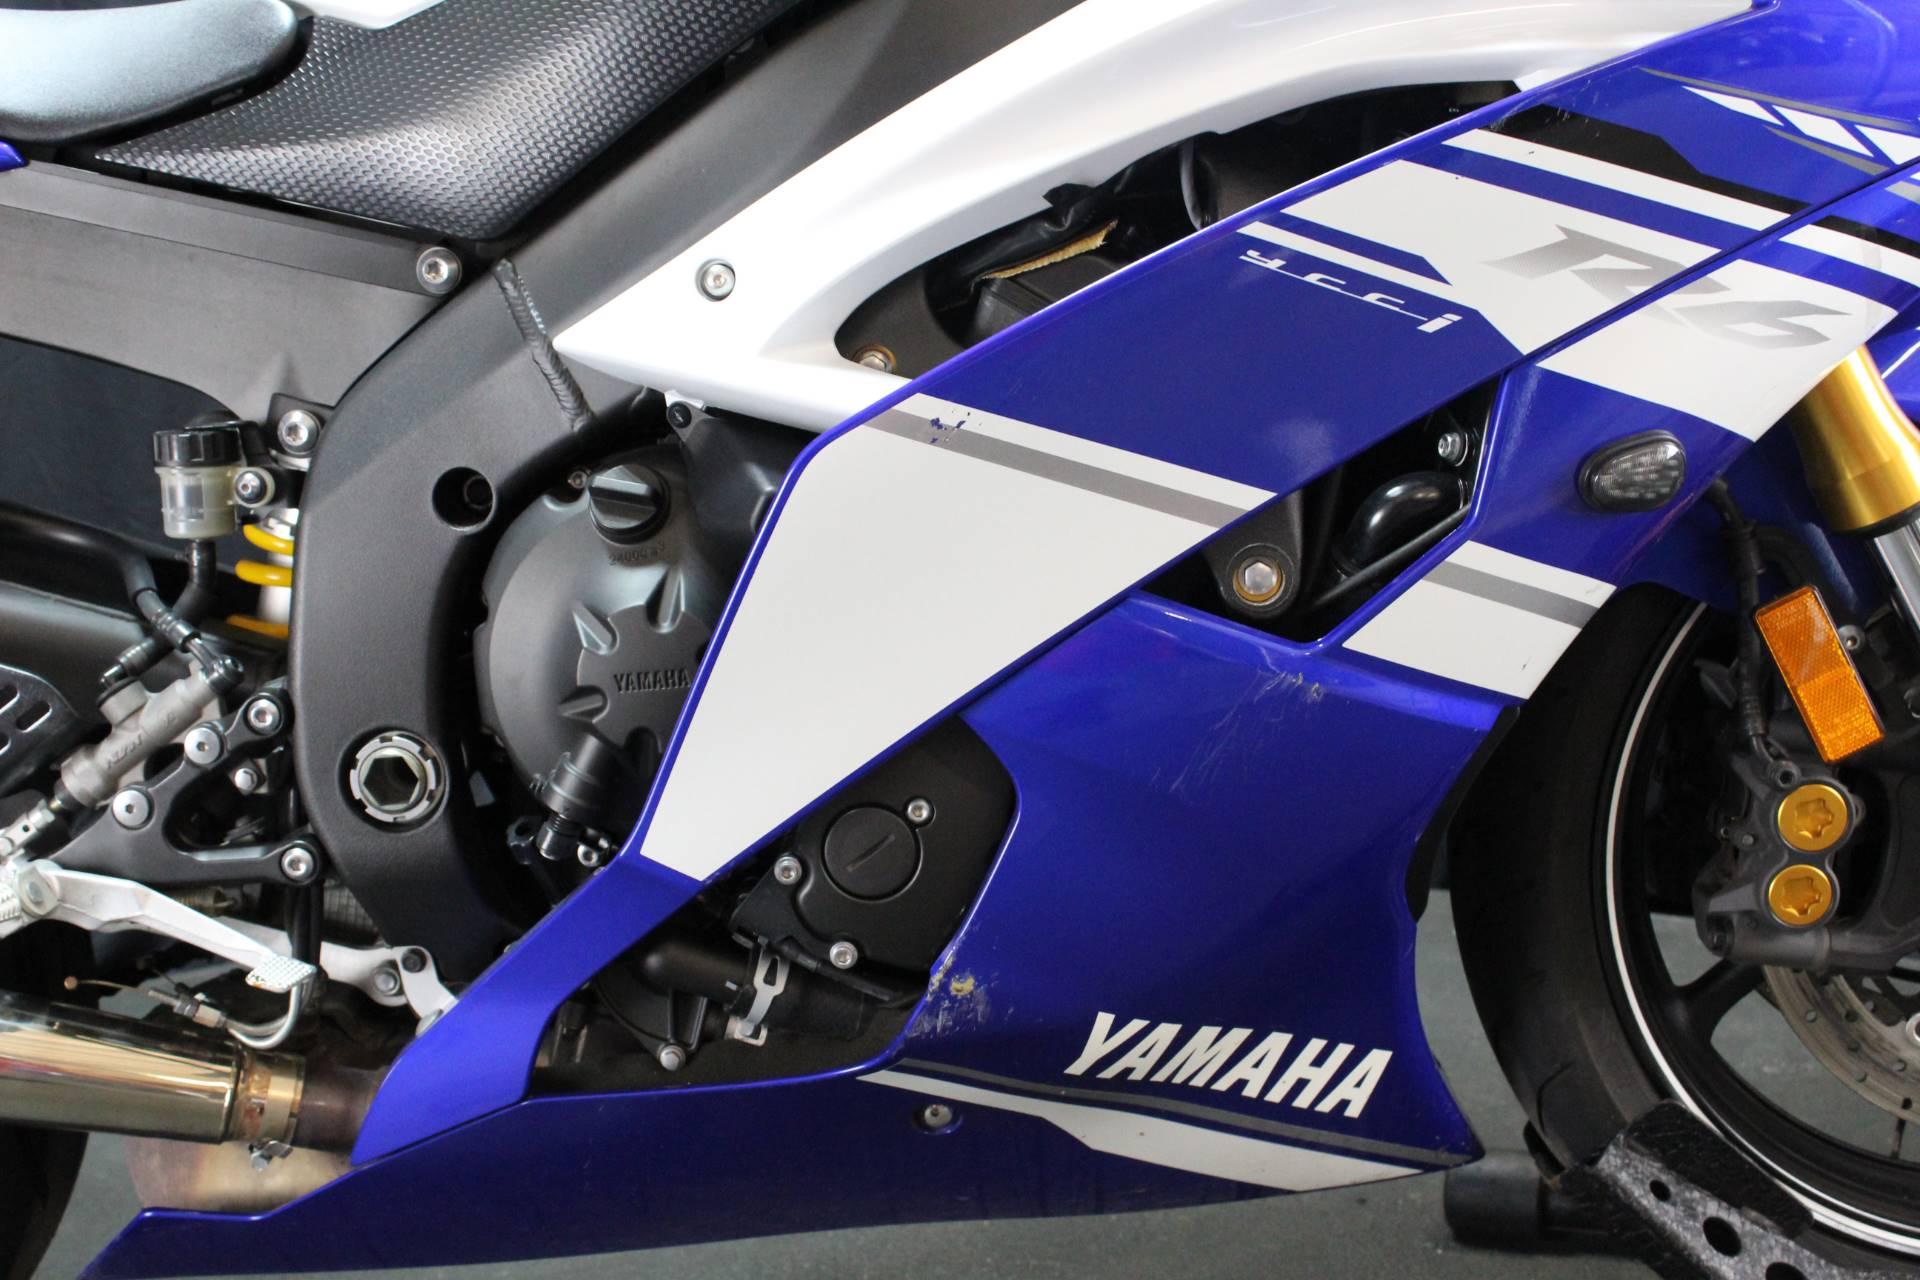 2014 Yamaha YZF-R6 4